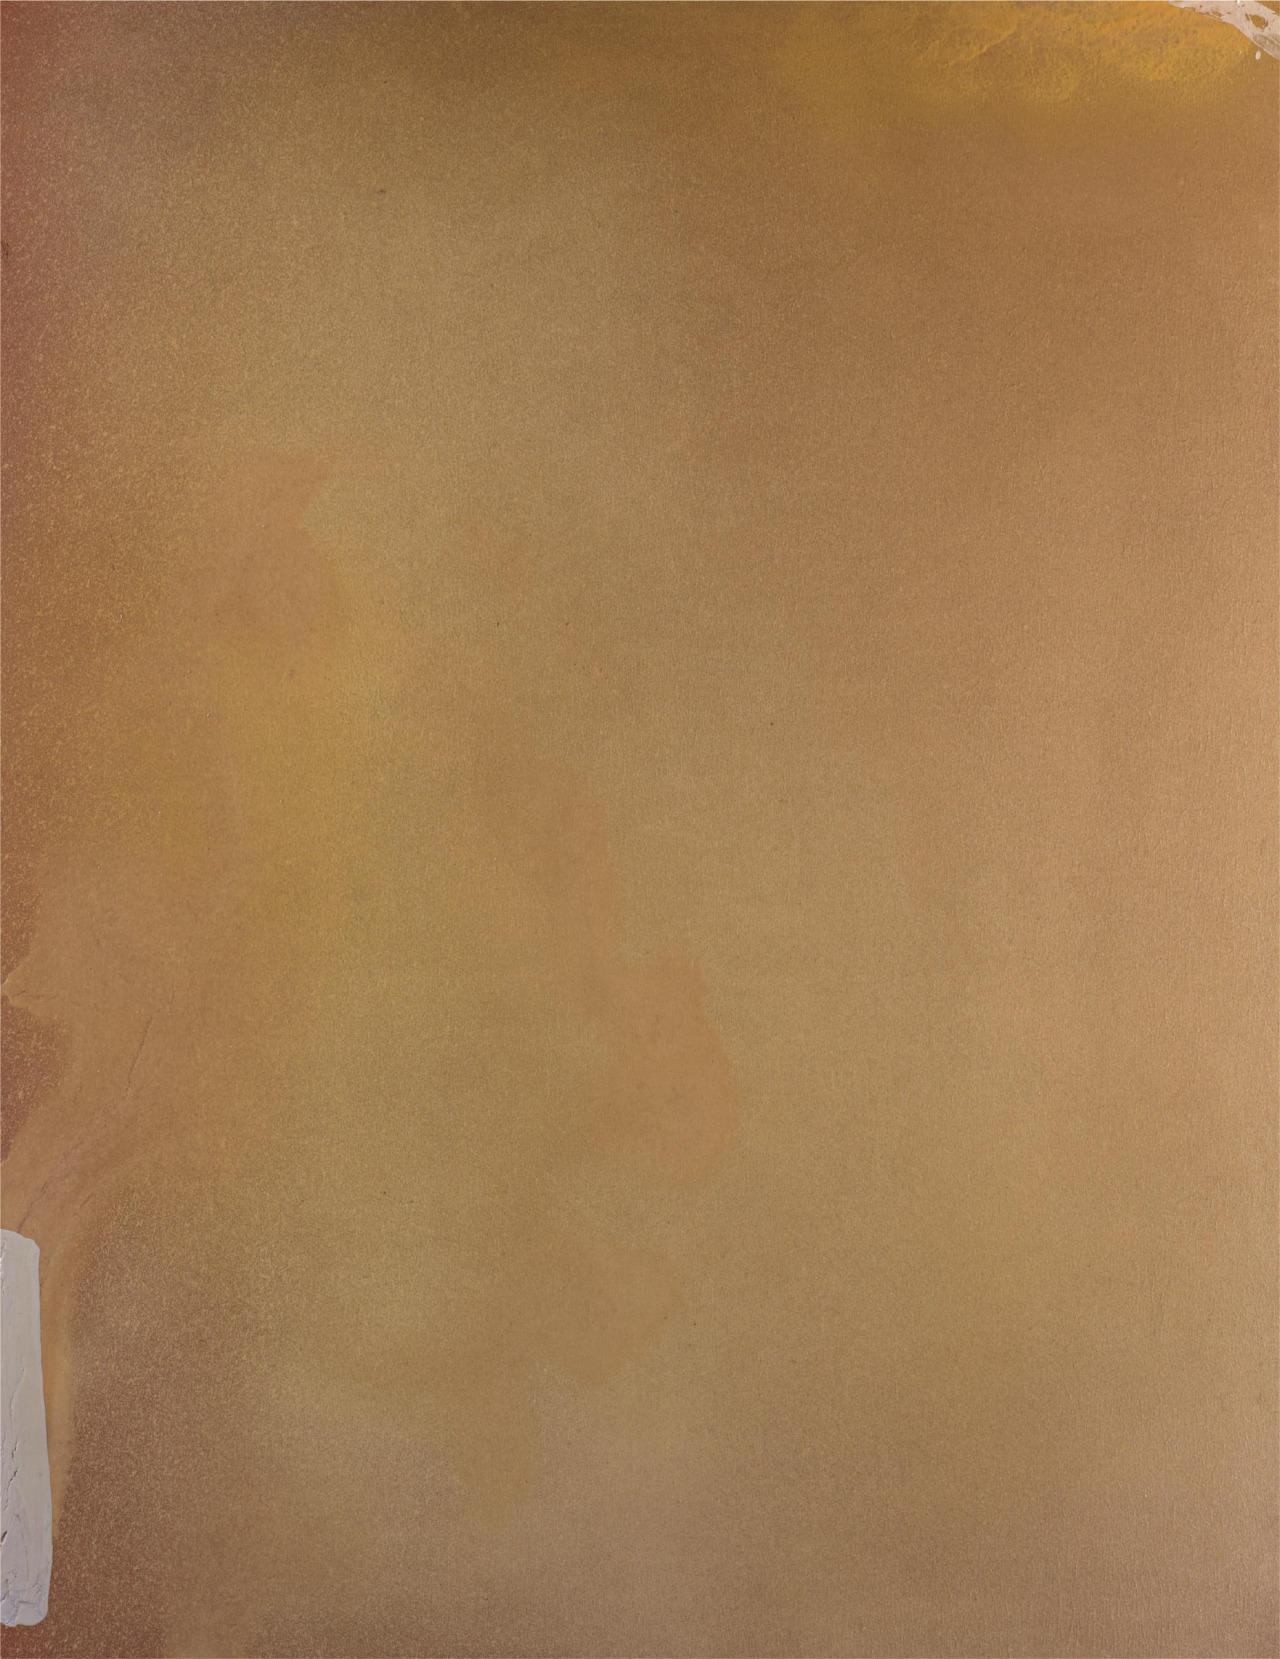 006b Jules Olitski Her Walk, 1971 Acrylic on canvas 234 × 181 cm.jpg